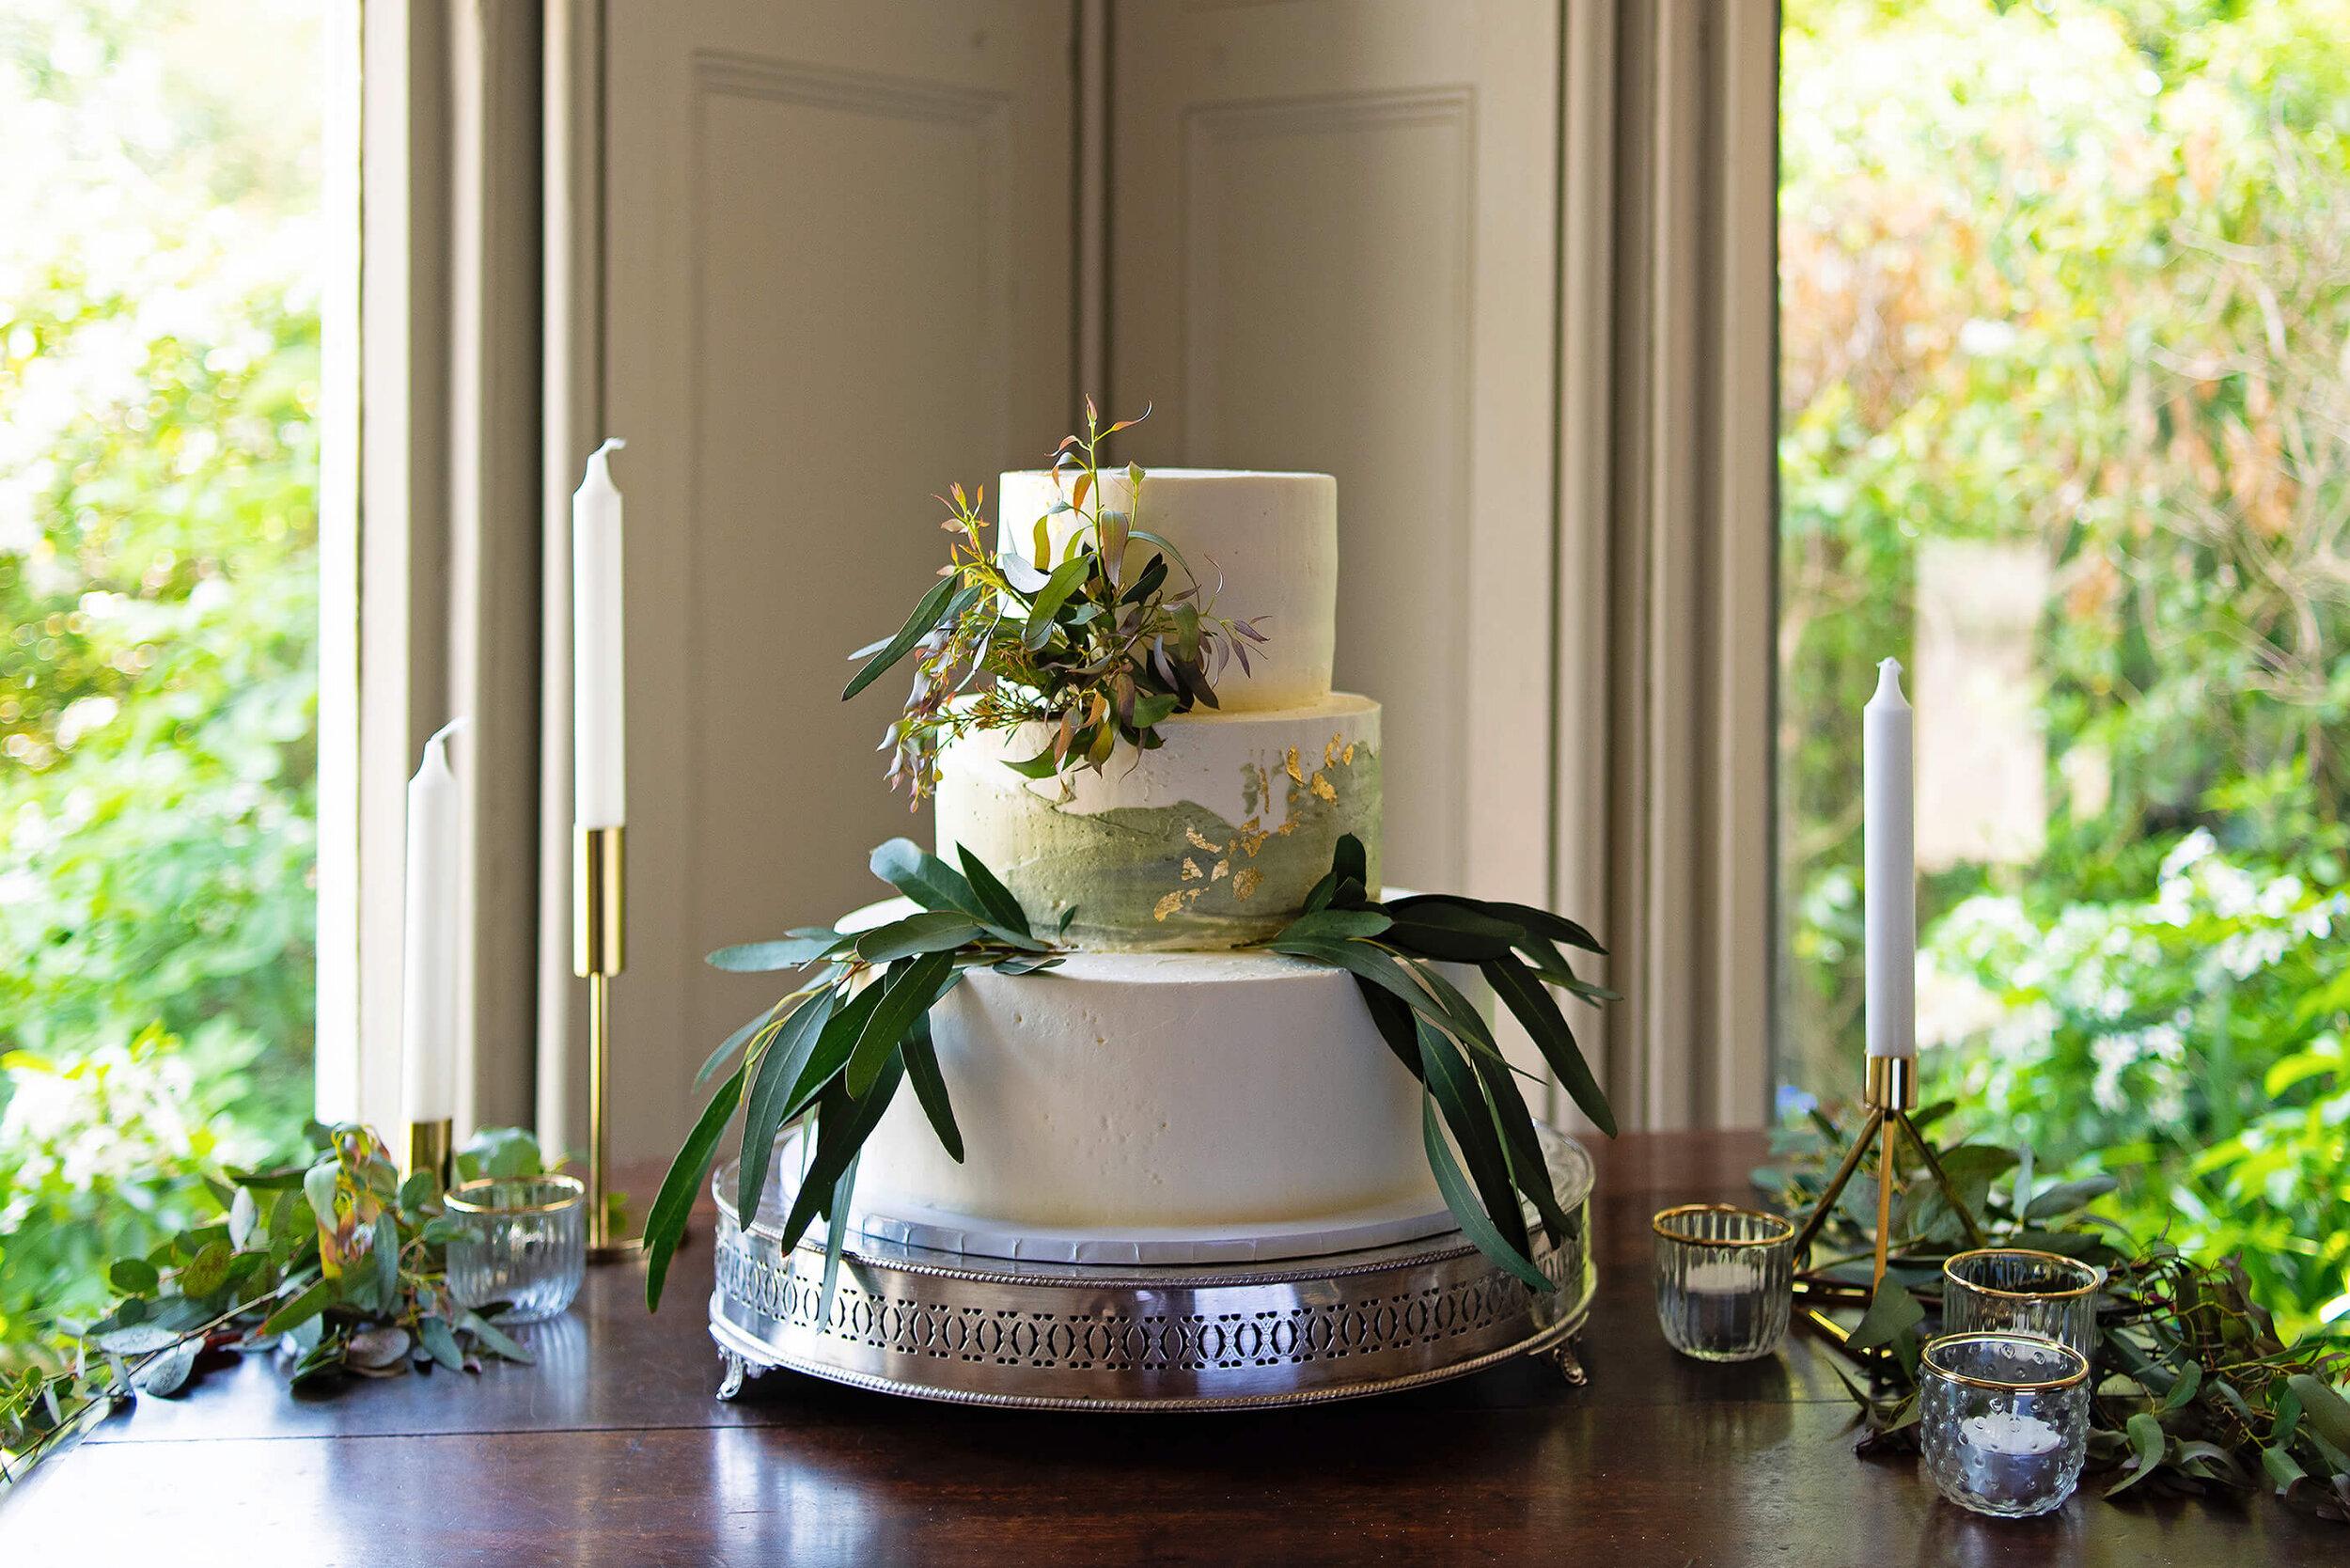 Cakes & Leaves Three Tier Eucalyptus Foliage and Gold Leaf Wedding Cake at Nurstead Court.